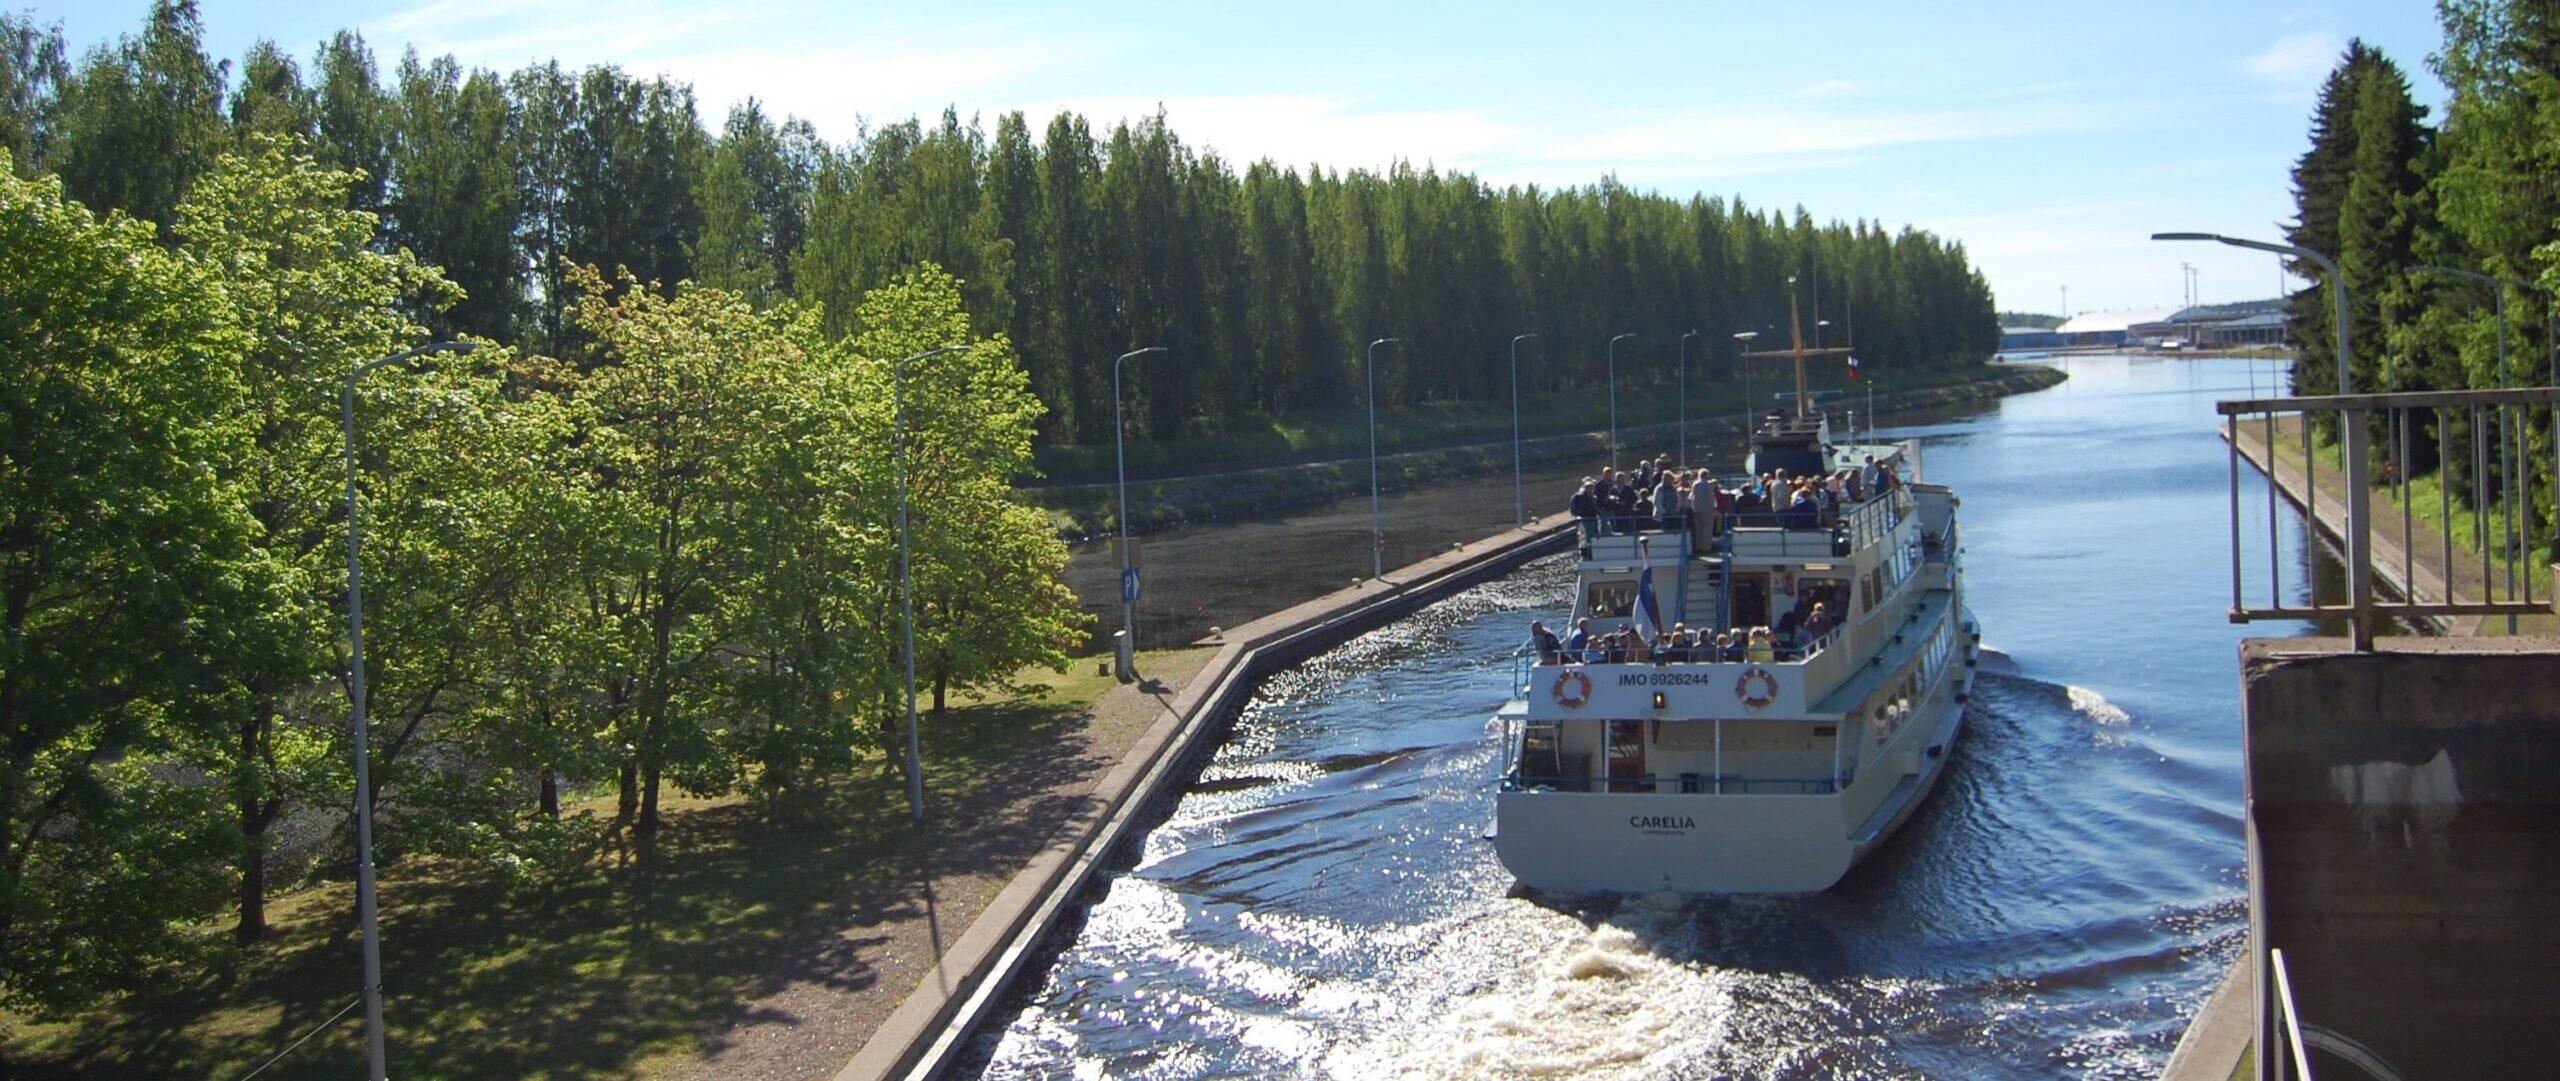 Reittimatka Lappeenranta-Nuijamaa / Nuijamaa-Lappeenranta